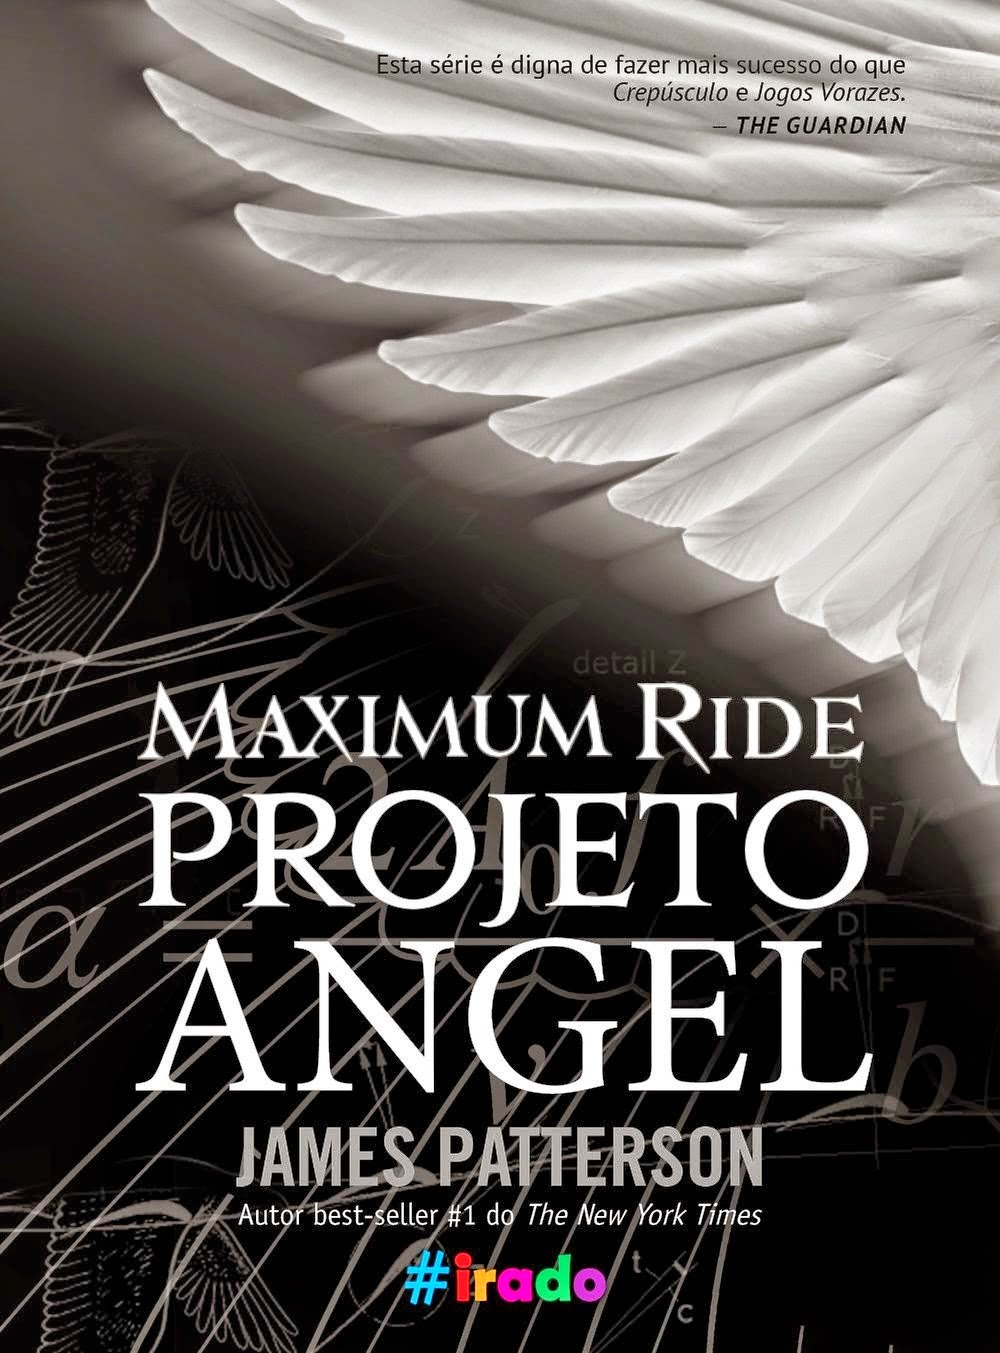 Capa - Maximum Ride - Projeto Angel - www.silencioqueeutolendo.com.br